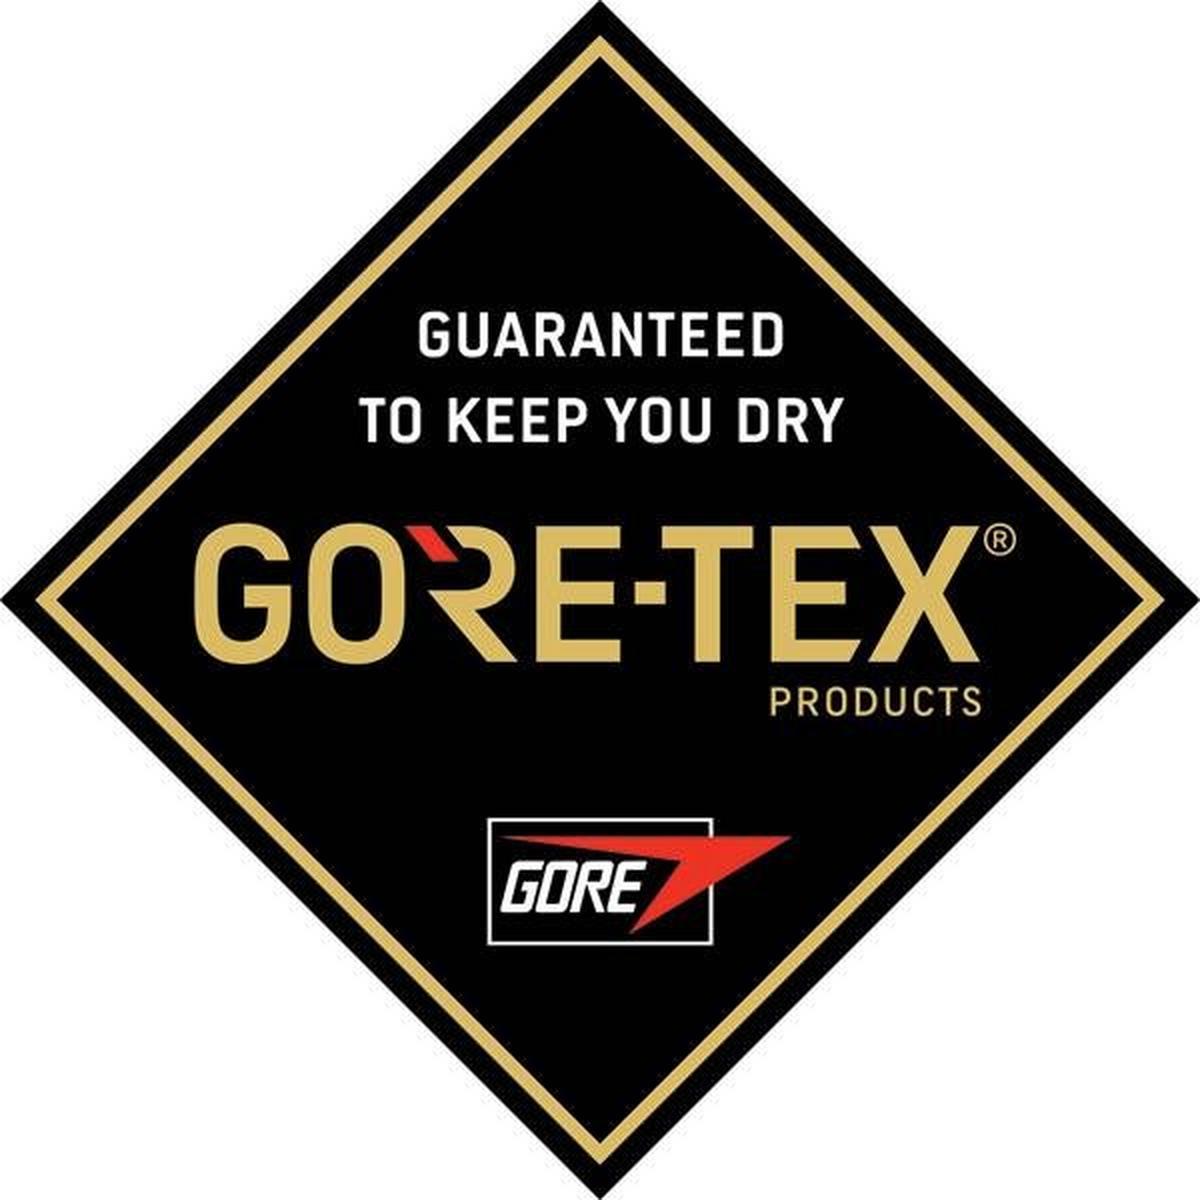 Mcnett Gear Aid (McNett) Tenacious Tape GORE-TEX Fabric Patches Black